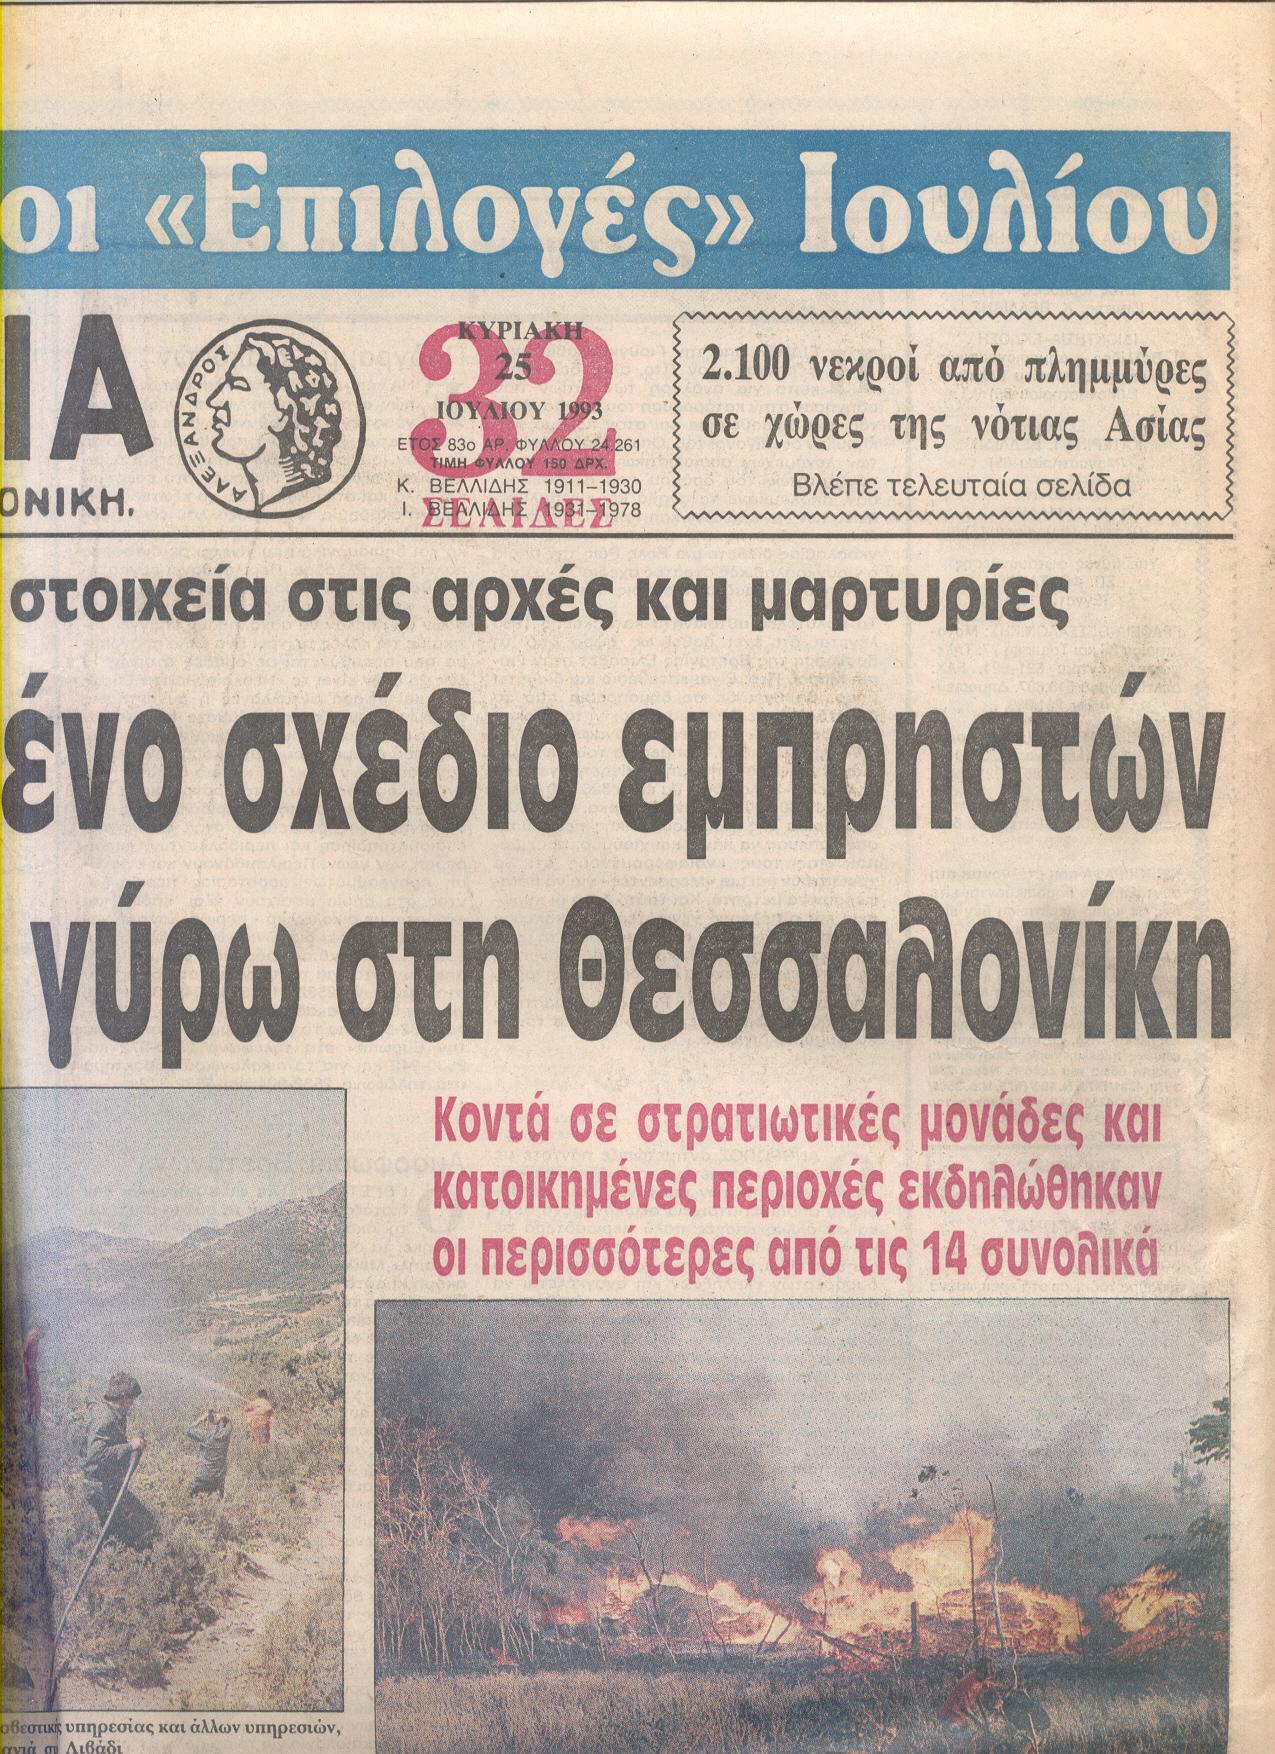 Evangelos Katsioulis in Makedonia newspaper, 1993